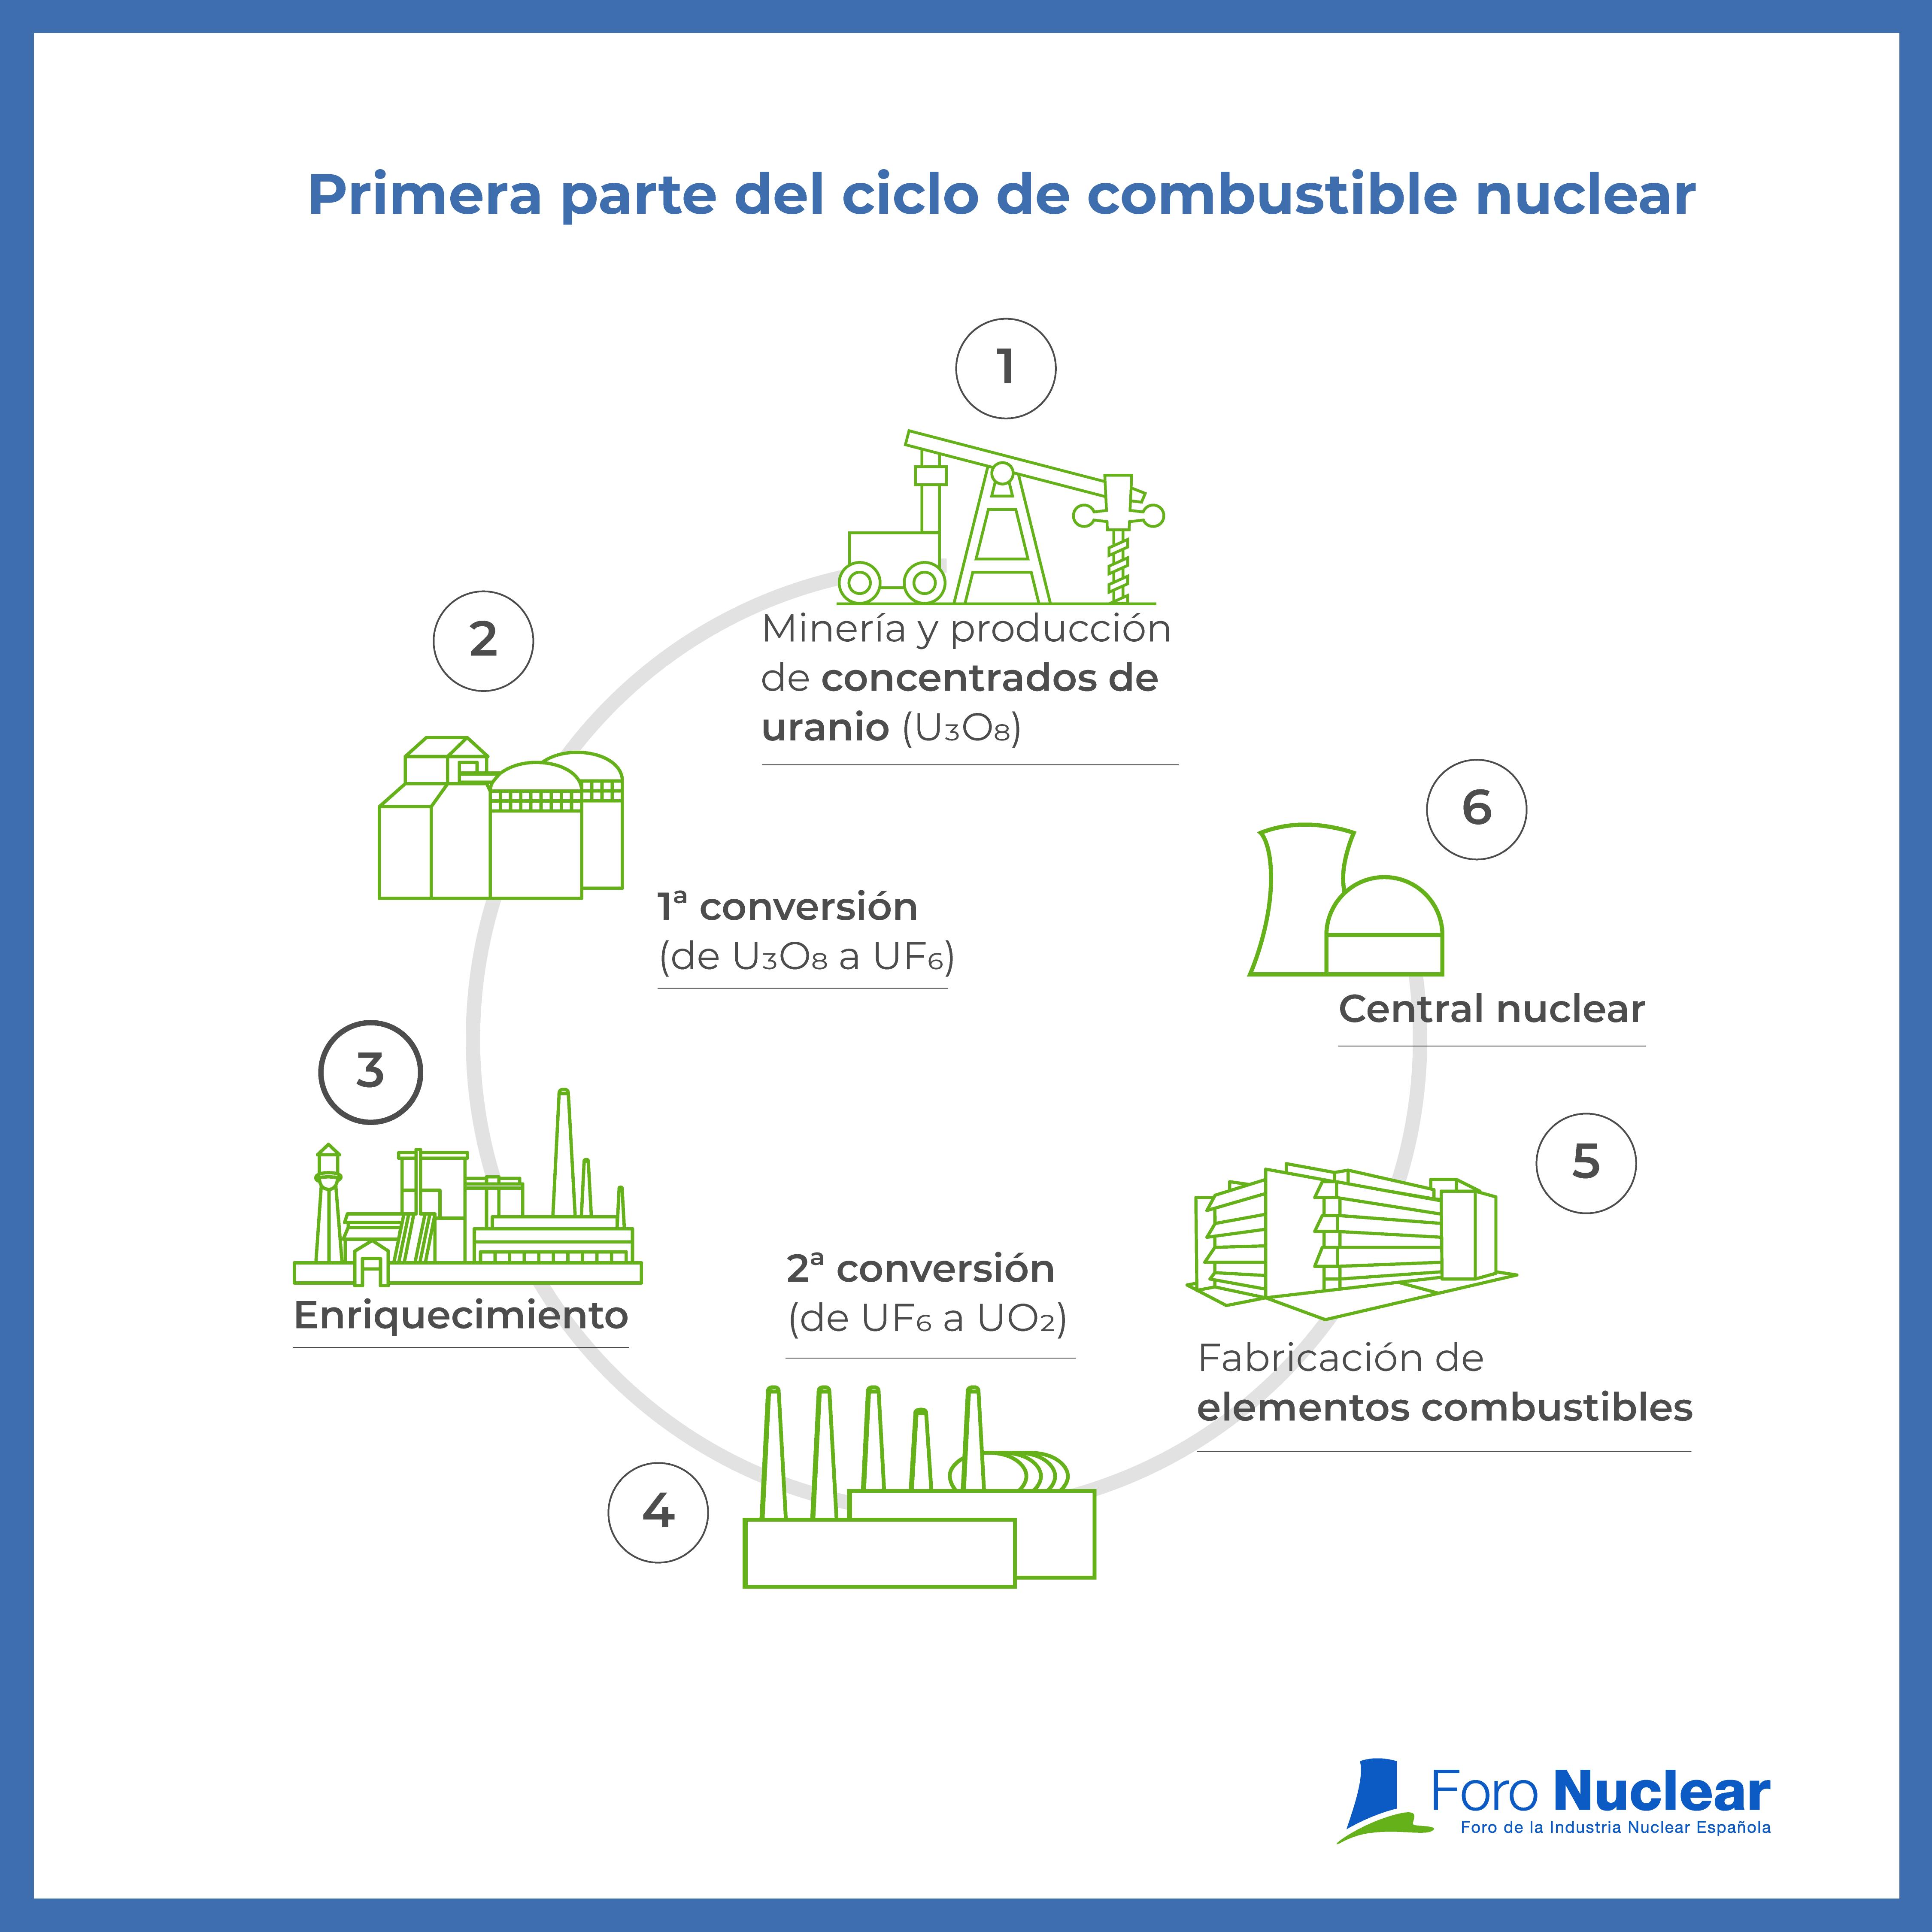 Primera parte del ciclo de combustible nuclear